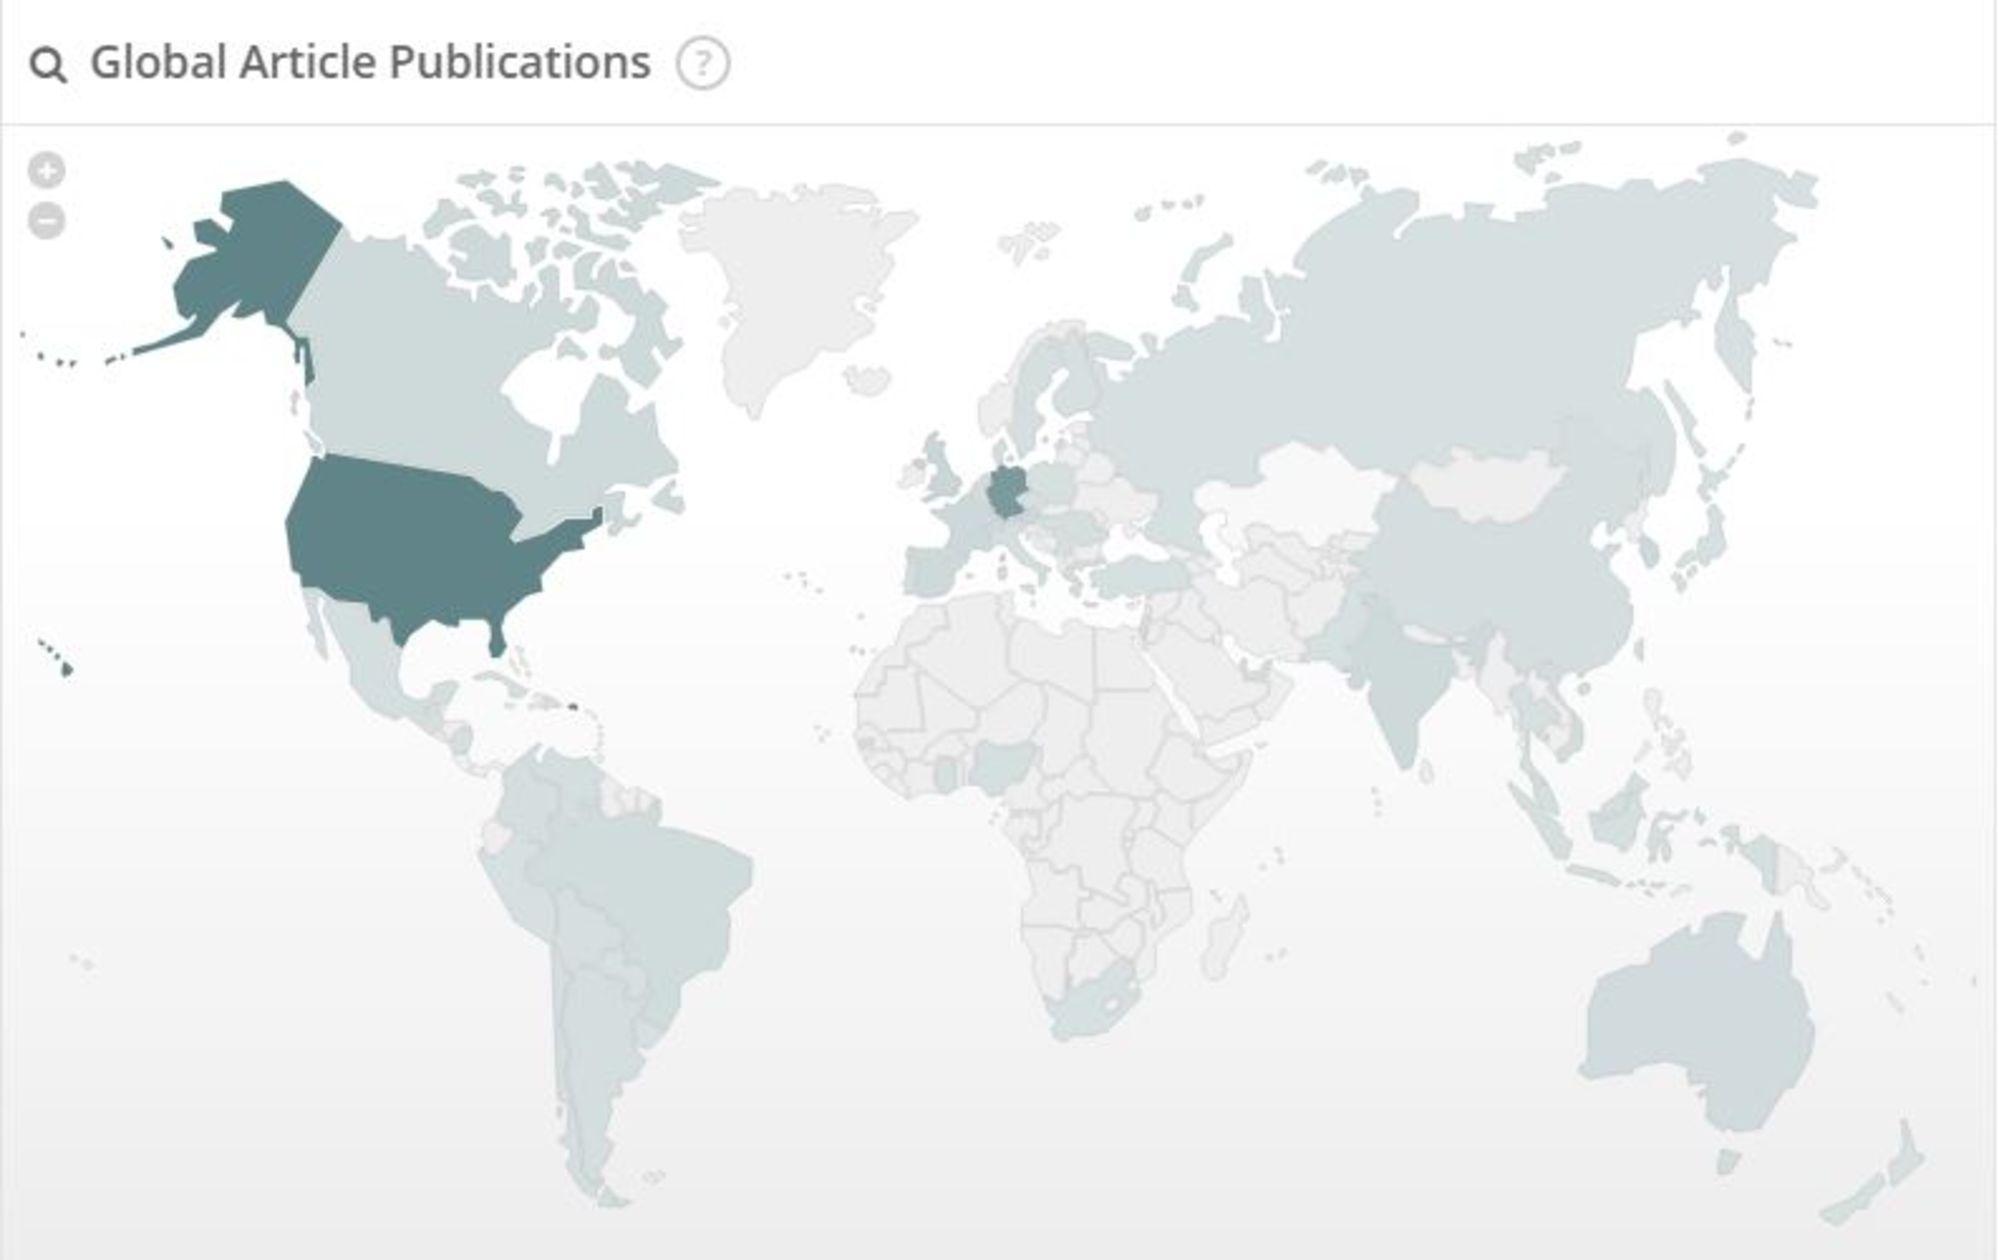 Viagra_4_Global Article Publications